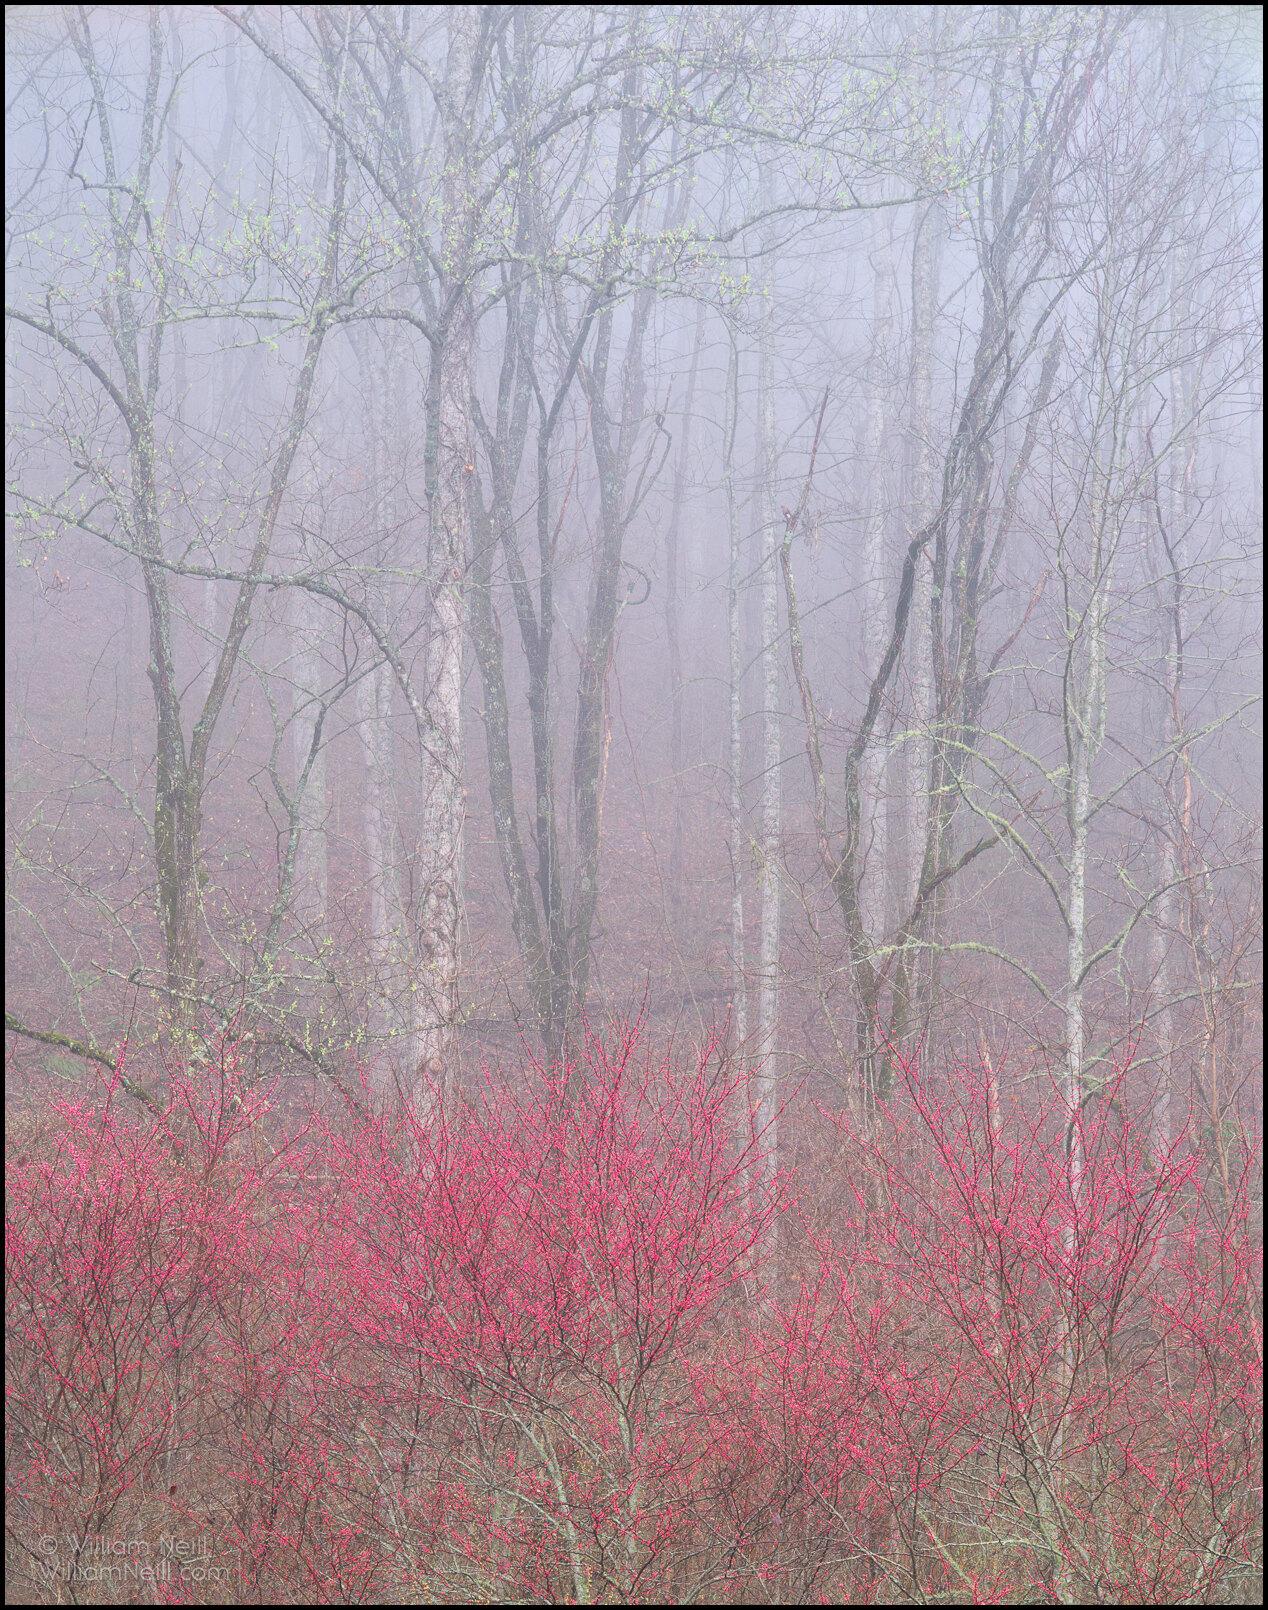 William Neill Photography, photo